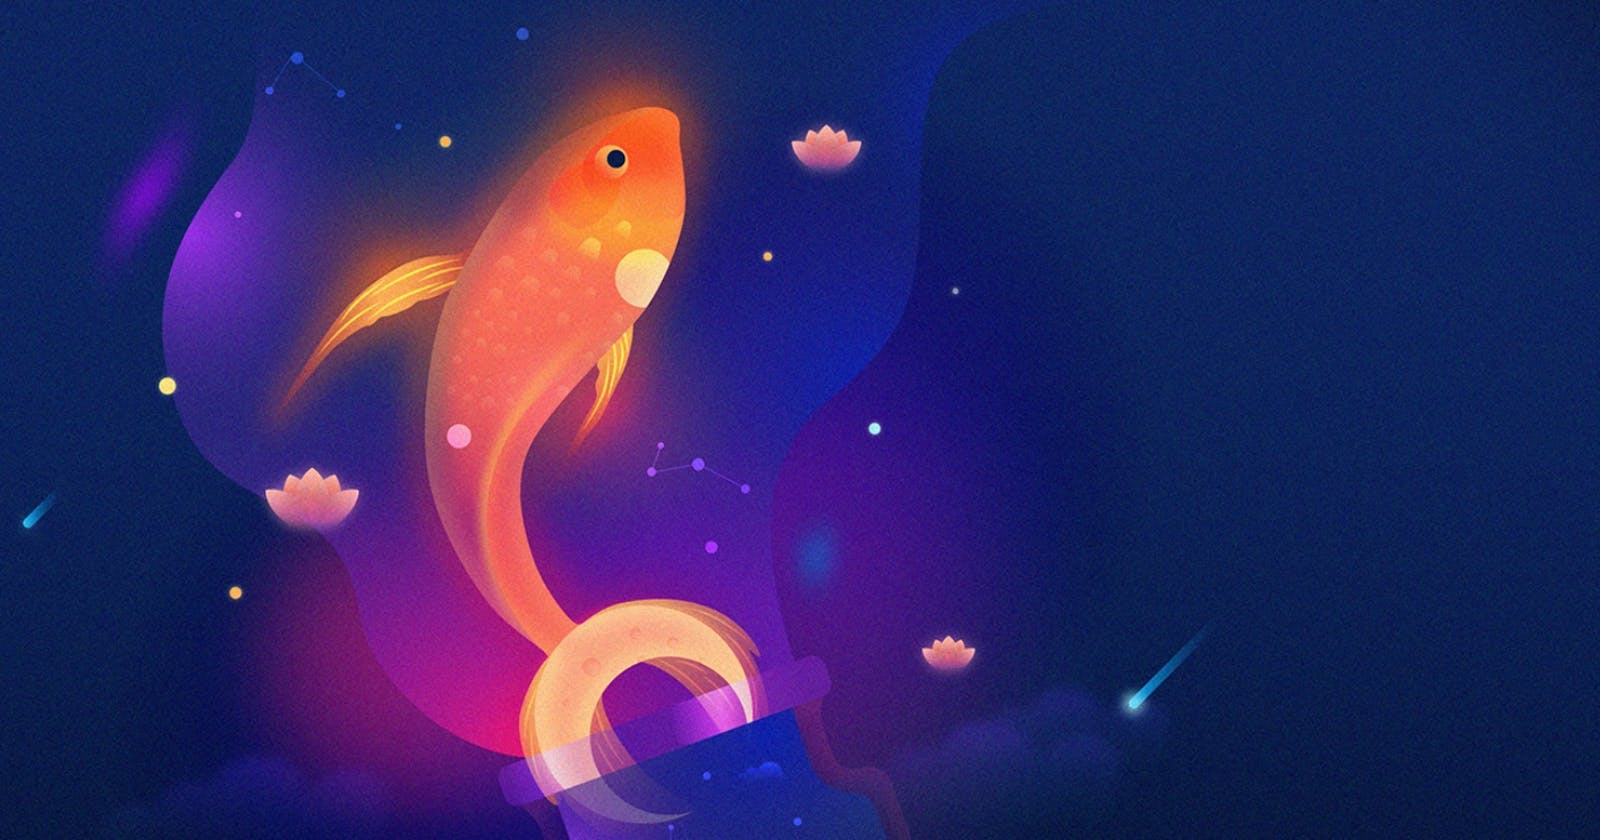 Introducing GoldFish : The minimalist Theme